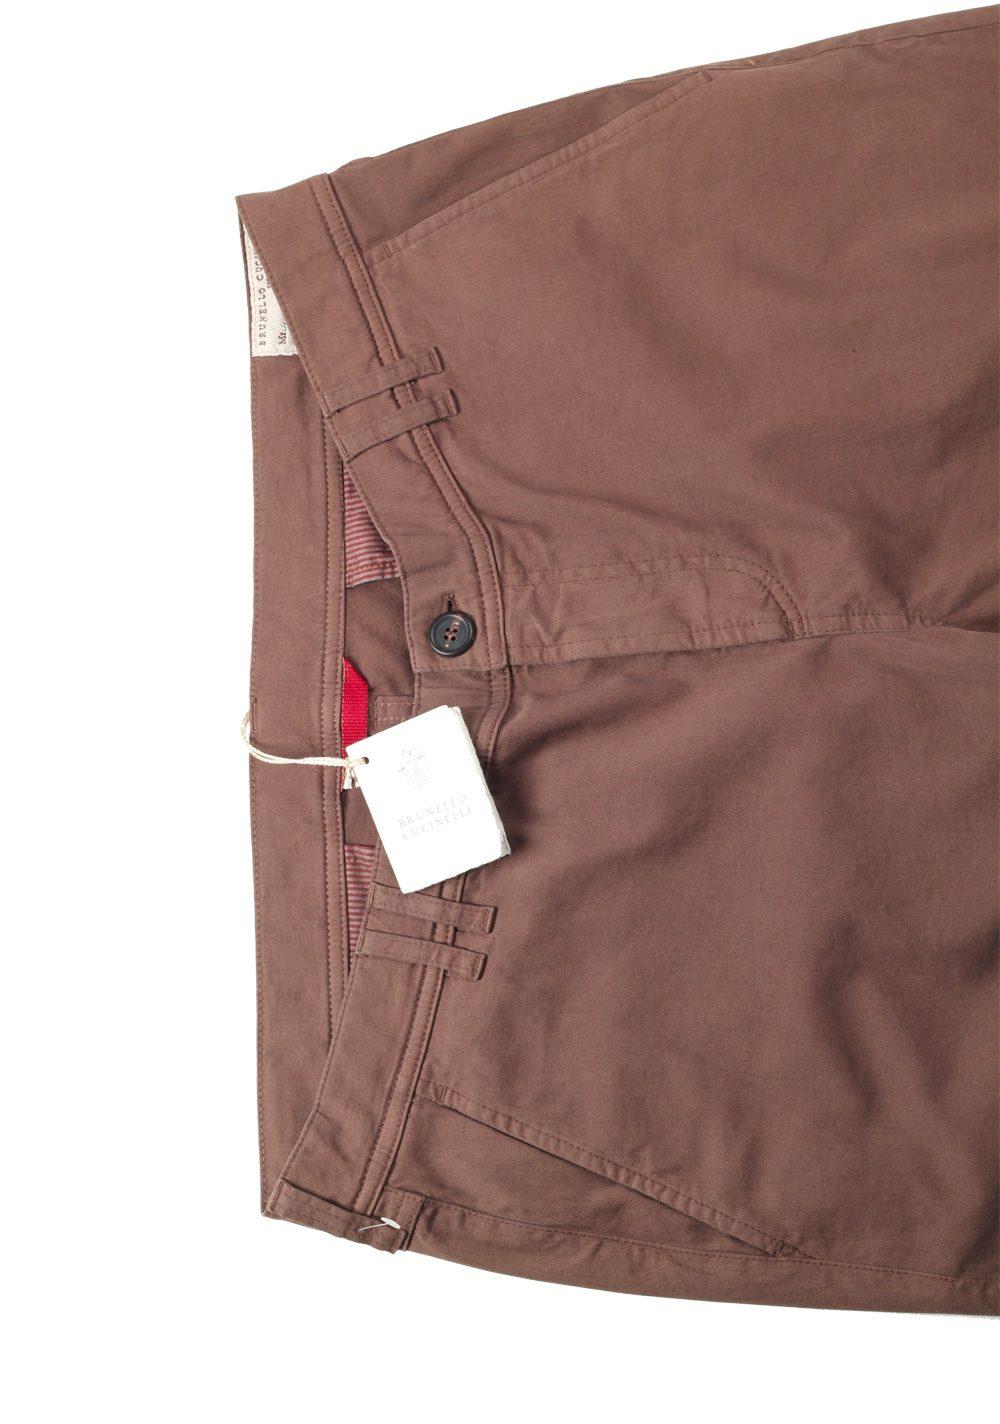 Brunello Cucinelli Brown Trousers Size 58 / 42 U.S. | Costume Limité